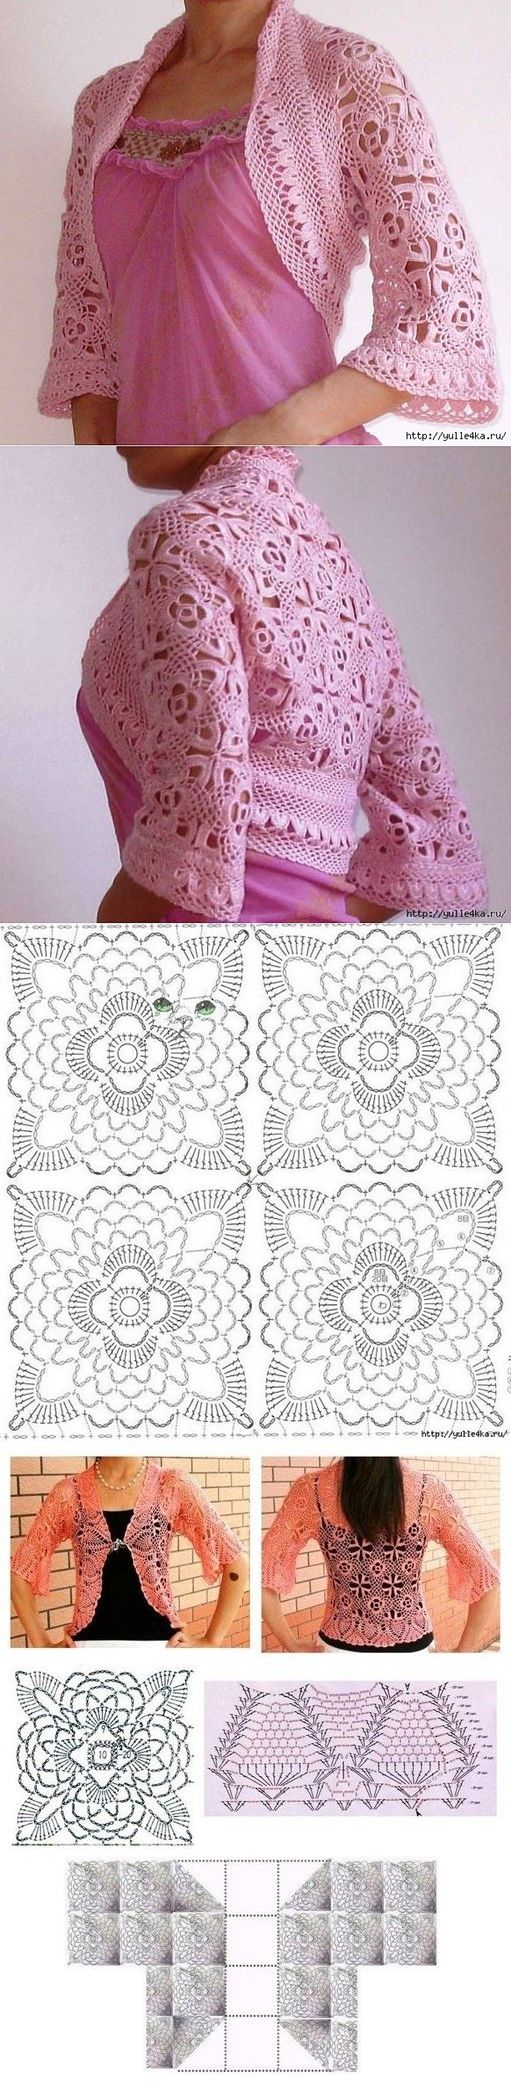 1322 best Chochet images on Pinterest | Crochet patterns, Knitting ...